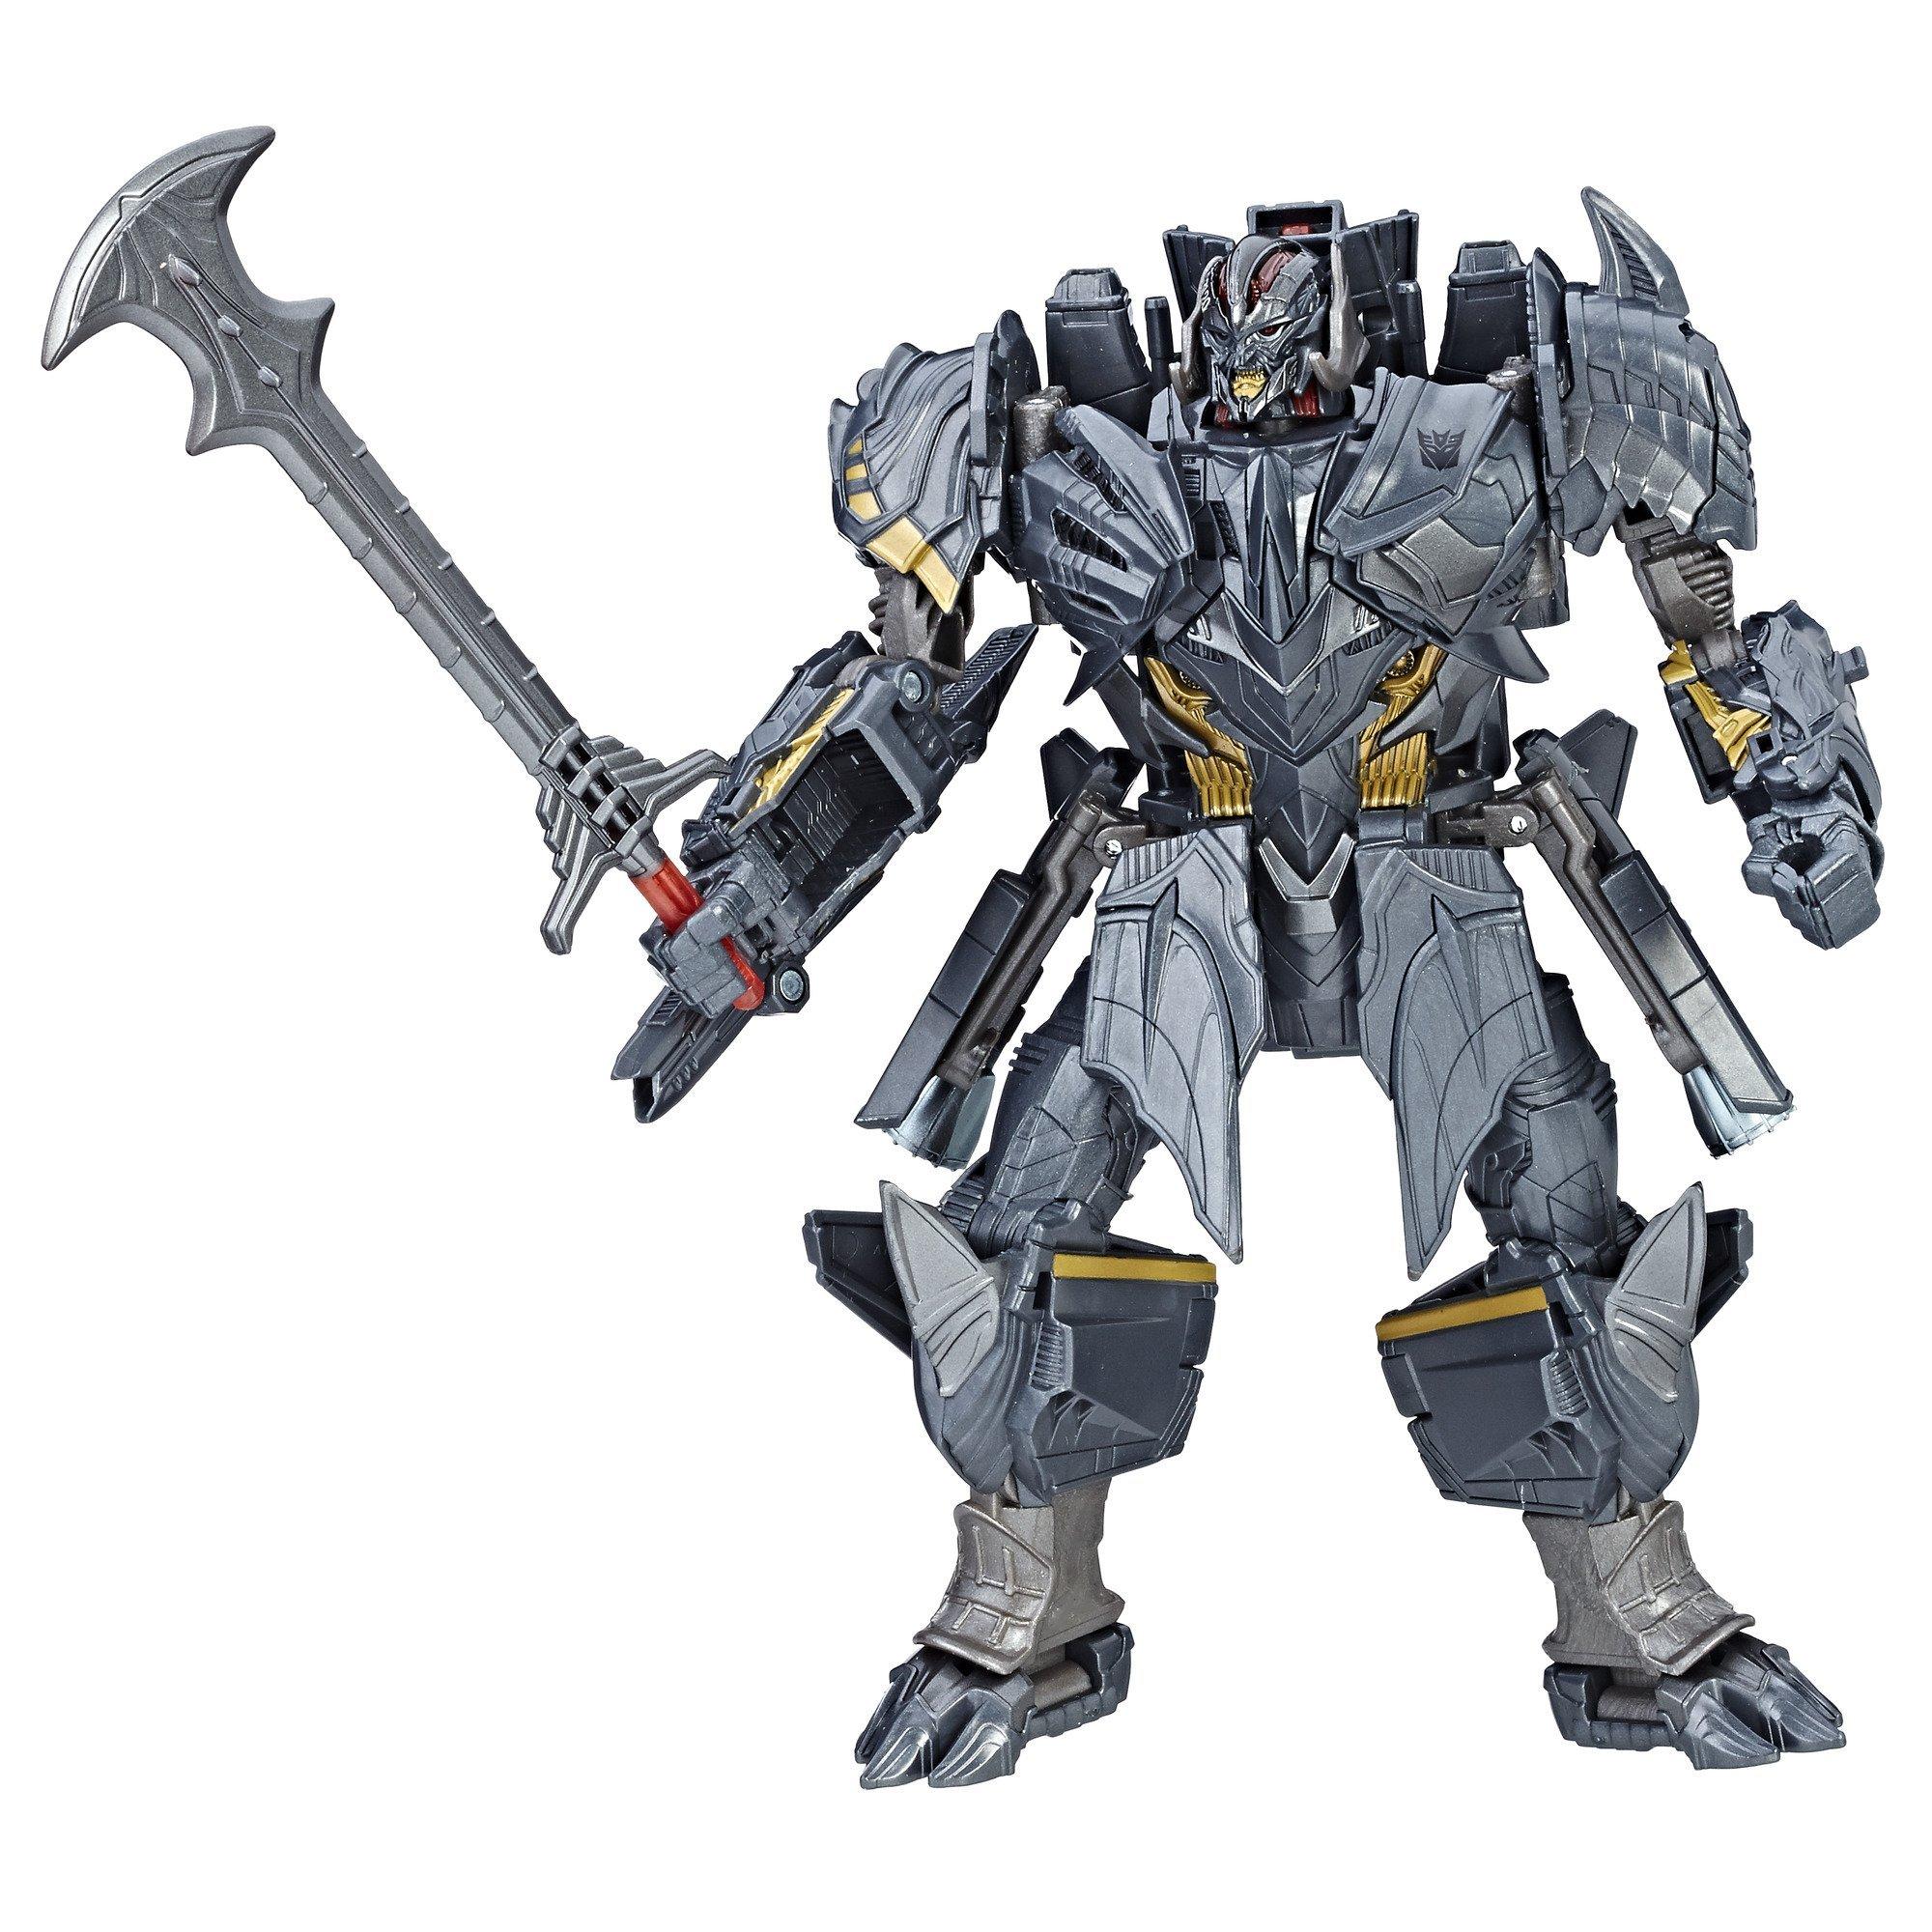 Megatron (Voyager) - Transformers Toys - TFW2005